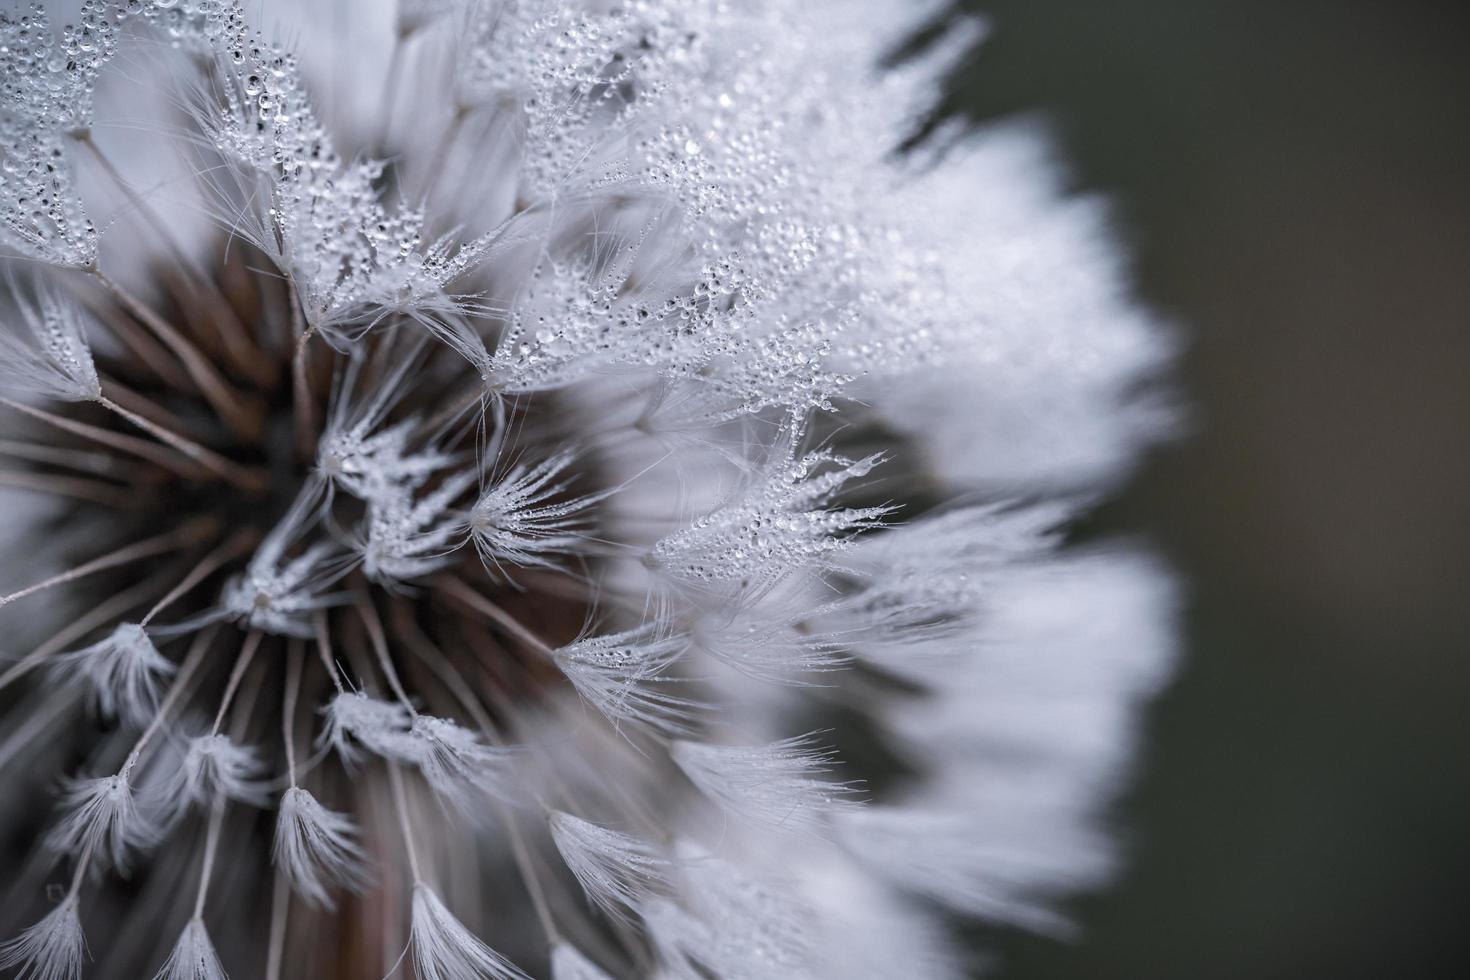 daggdroppar på vit blomma foto